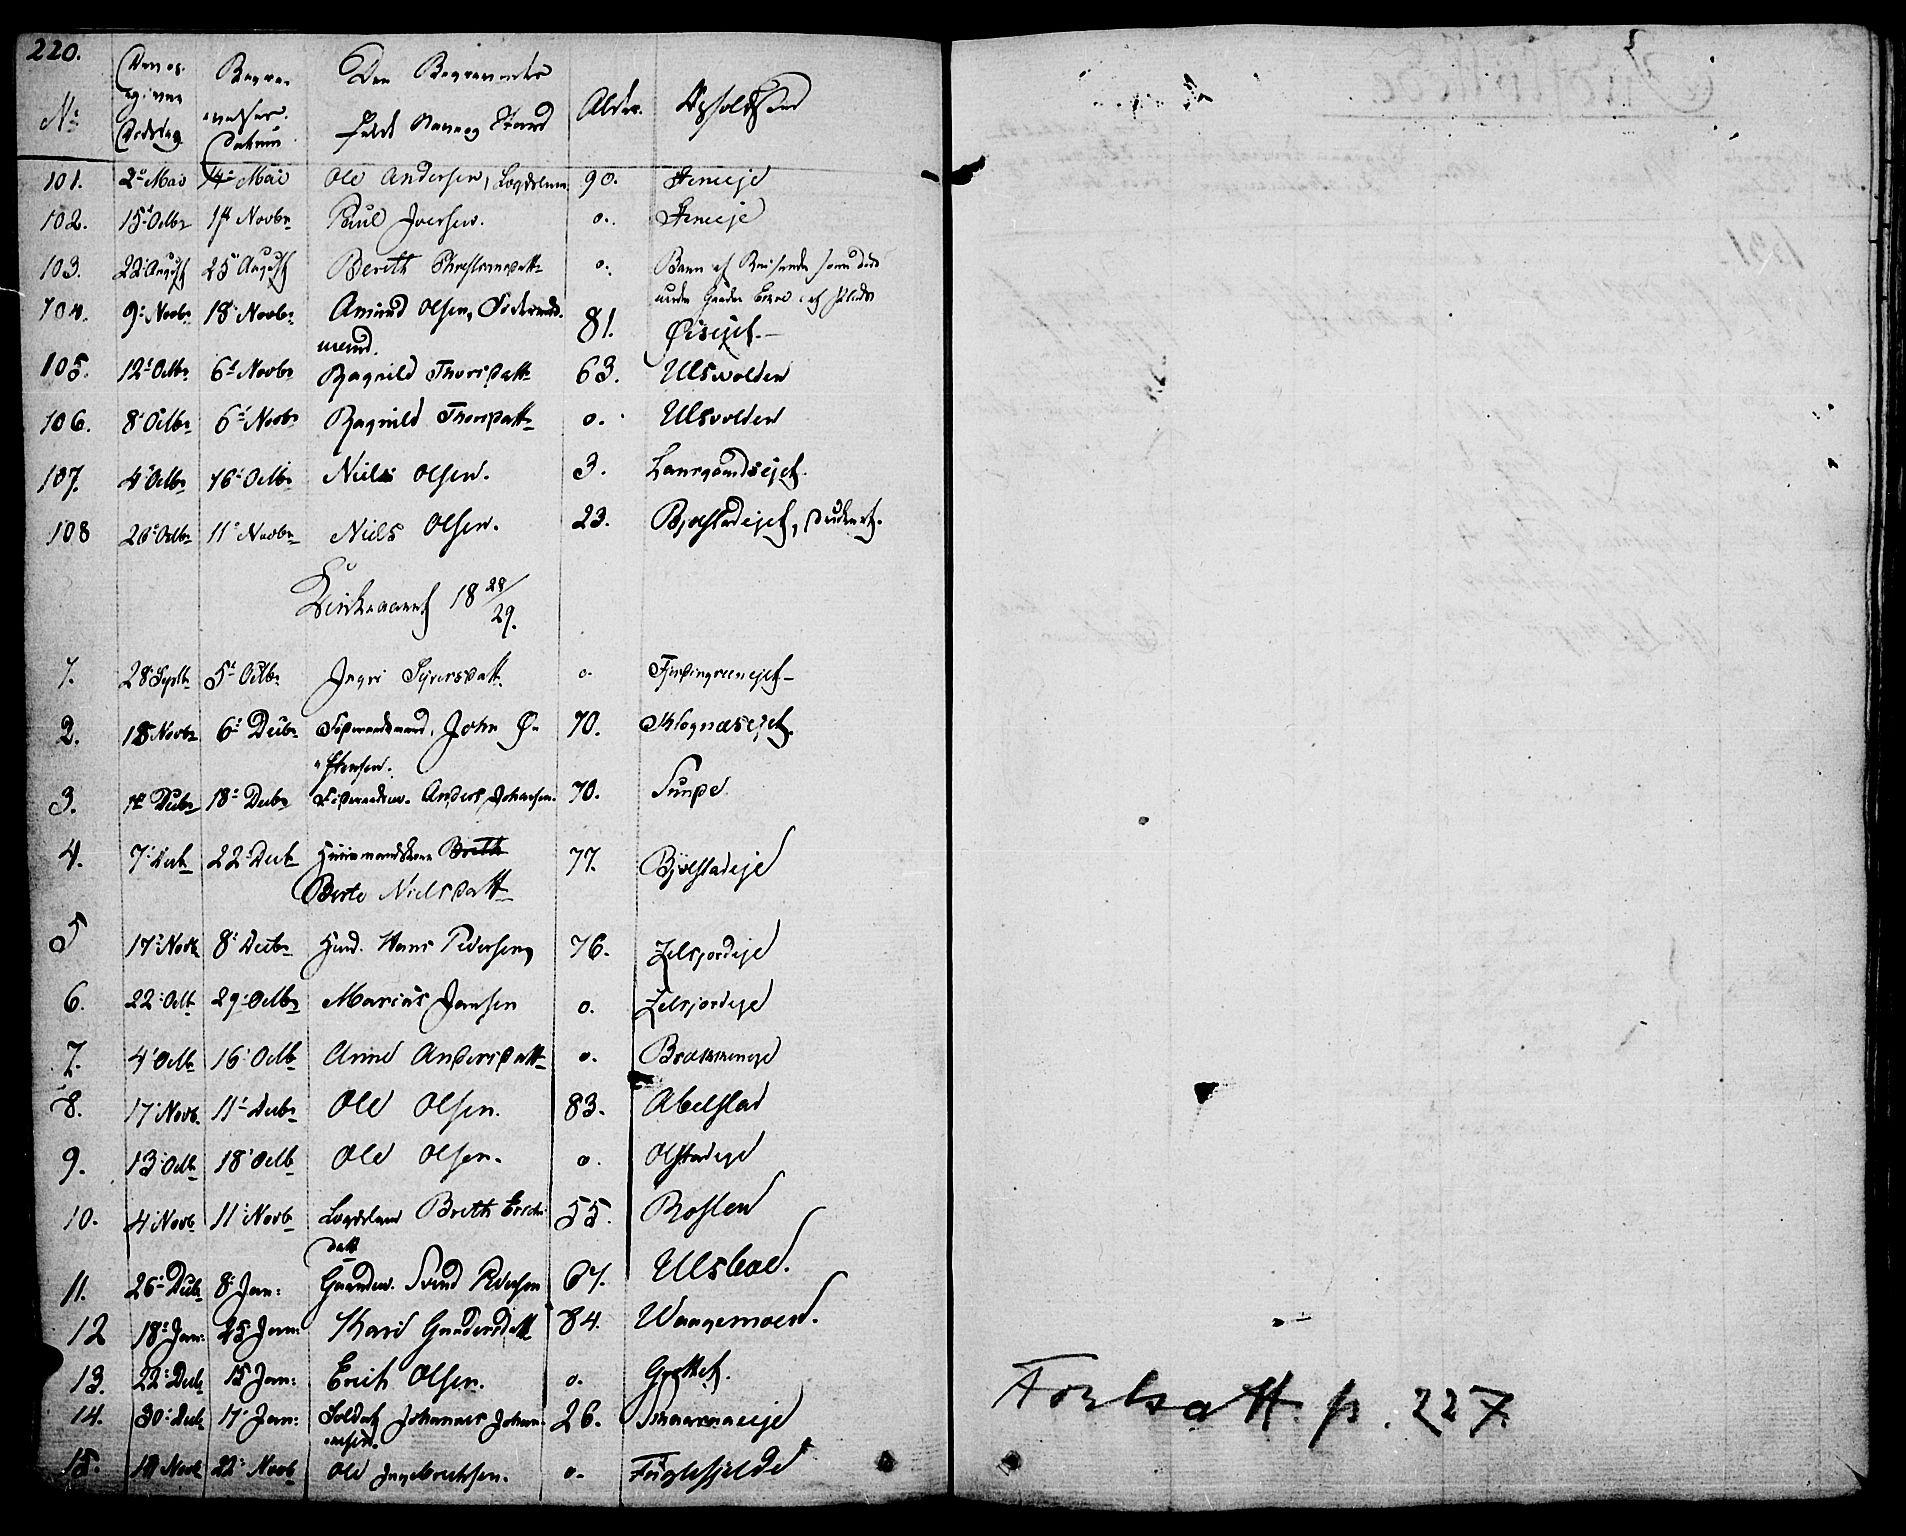 SAH, Vågå prestekontor, Ministerialbok nr. 4 /1, 1827-1842, s. 220